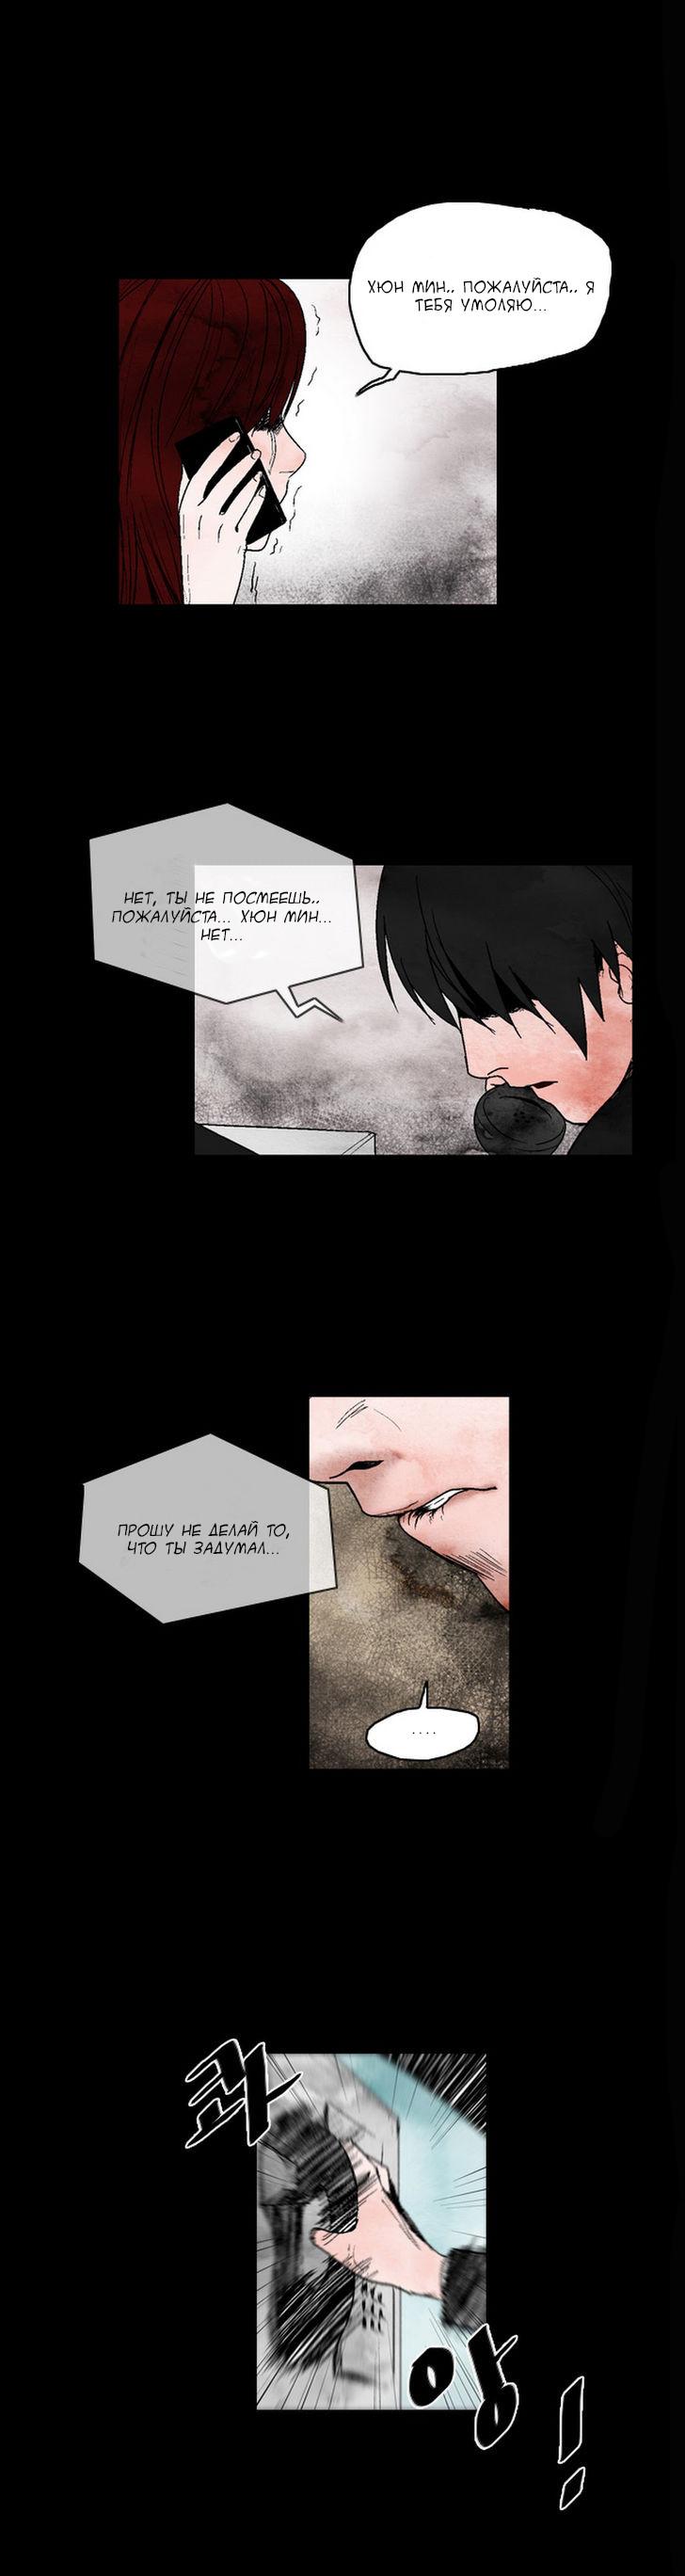 https://r1.ninemanga.com/comics/pic2/14/28302/409574/1519283742523.jpg Page 1